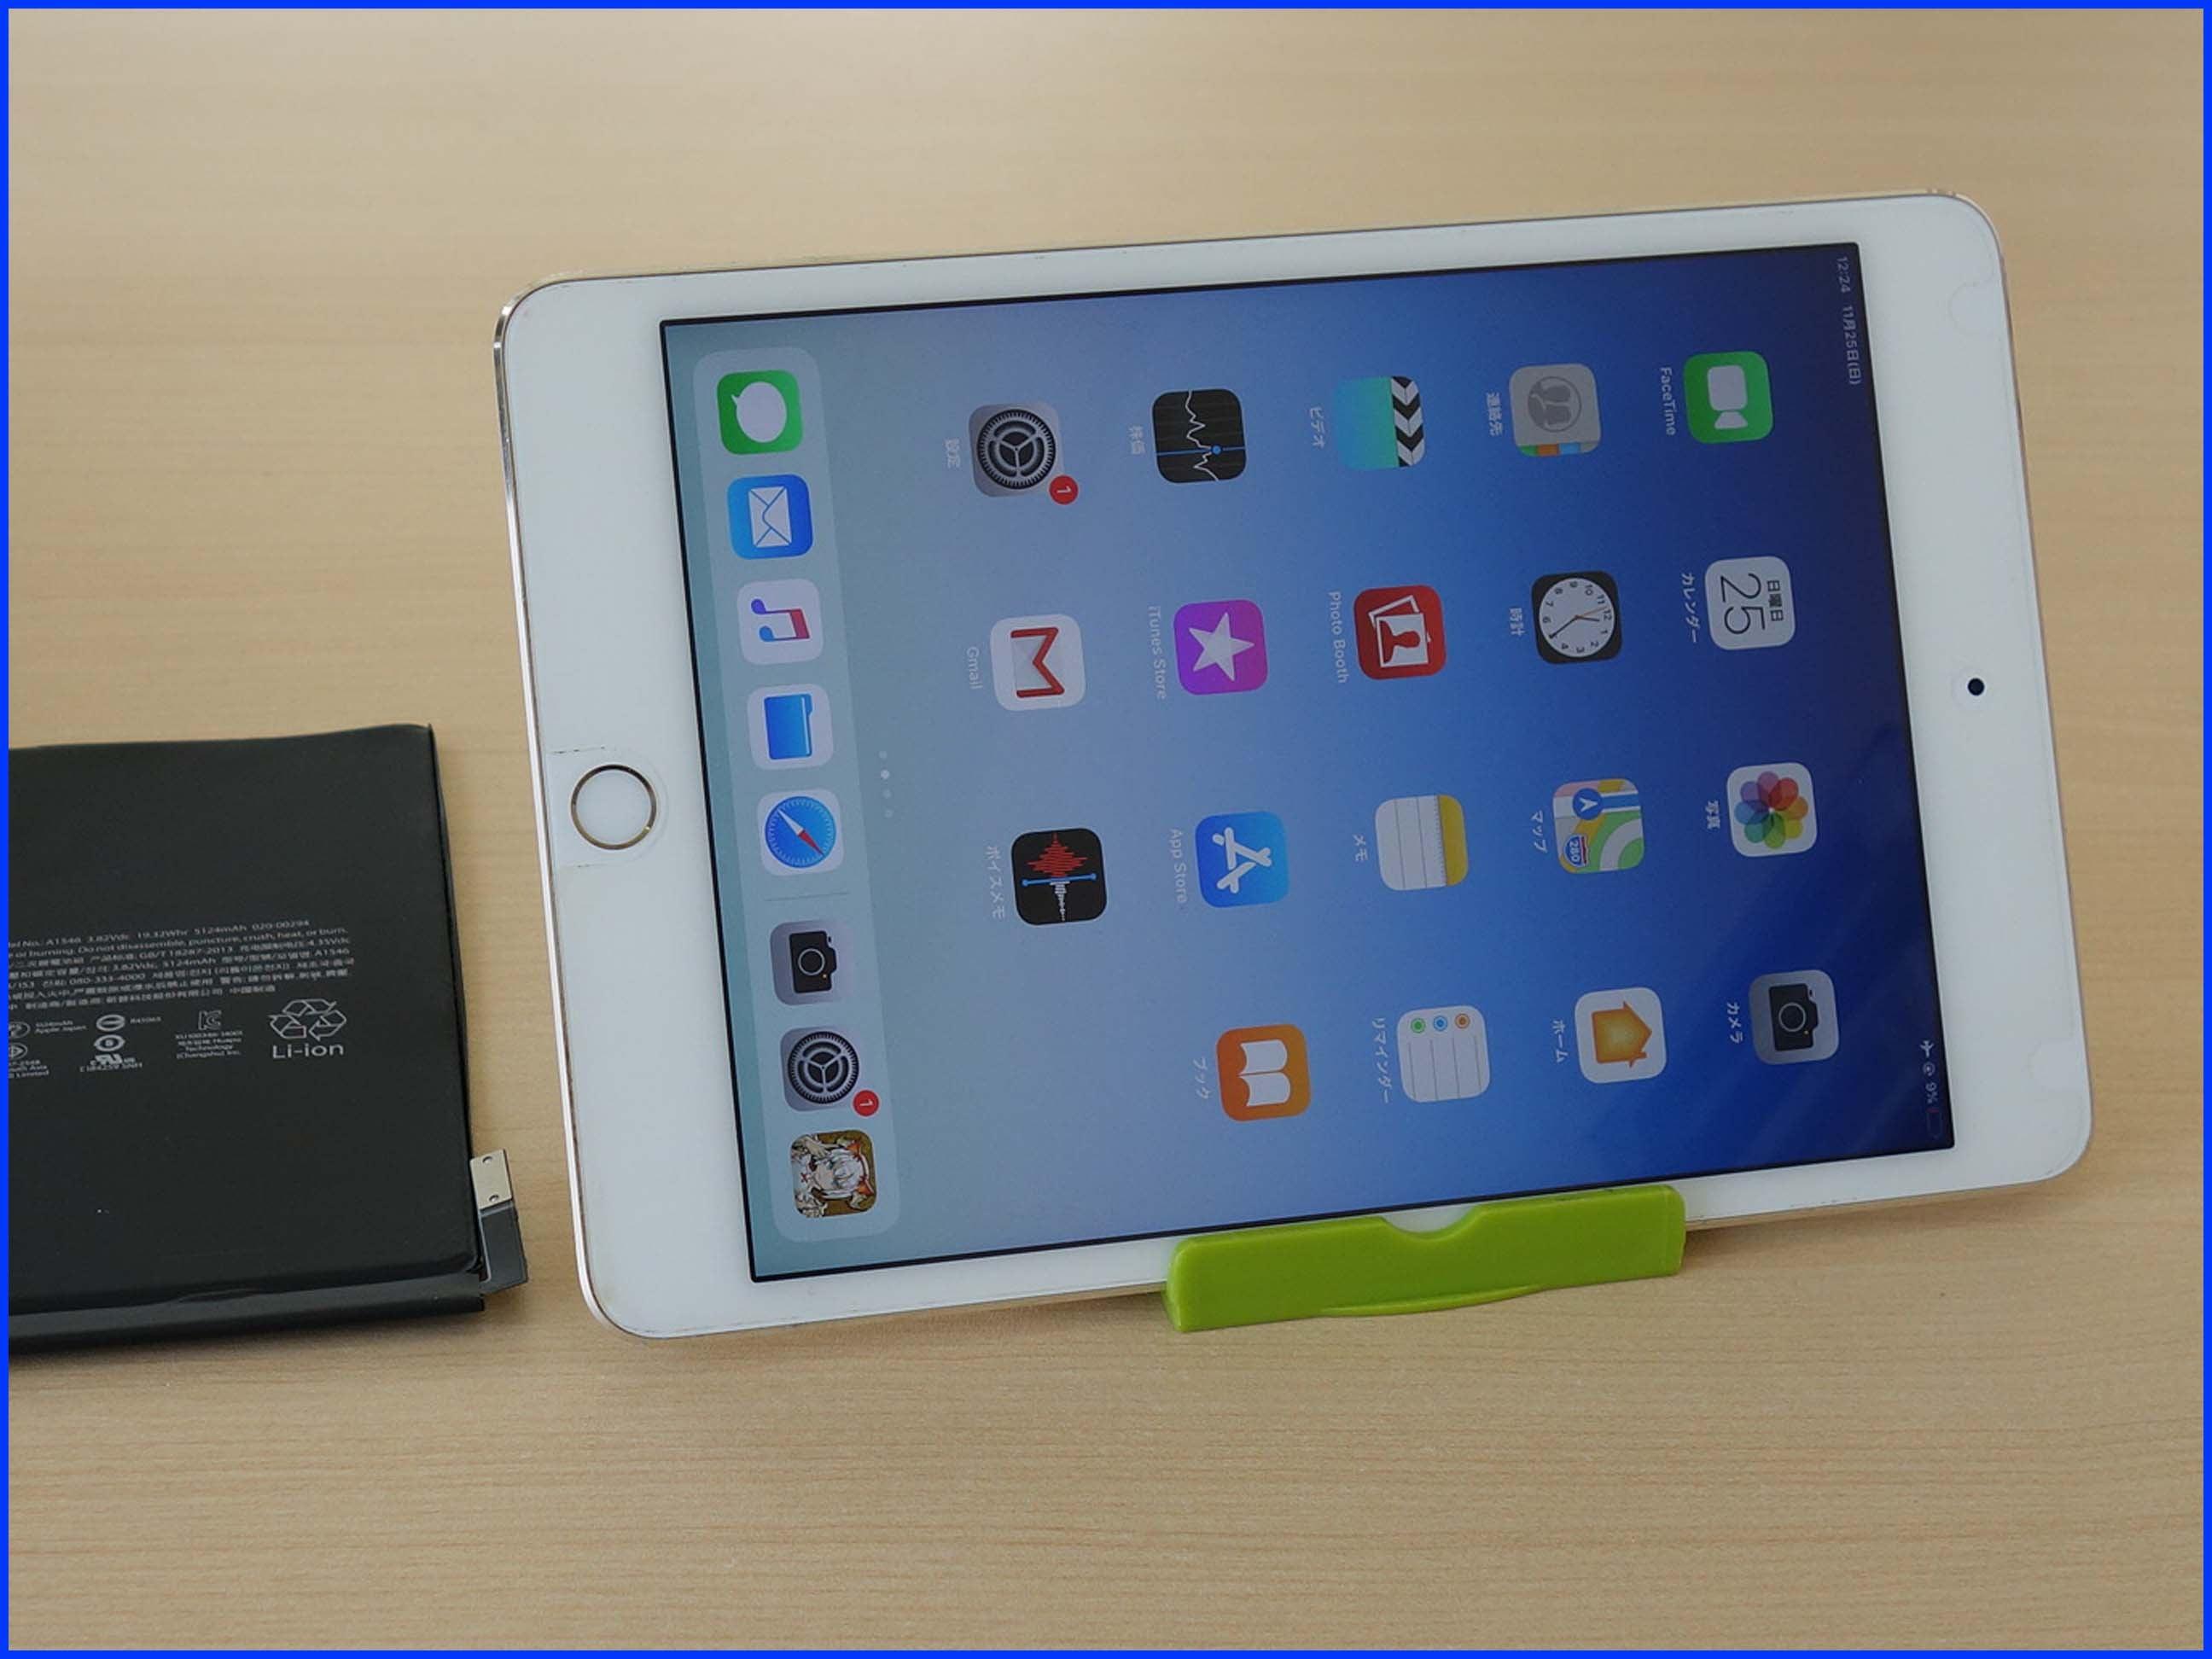 Ipad バッテリー 交換 【自分で修理は危険】iPadのバッテリー交換の目安と交換方法は?